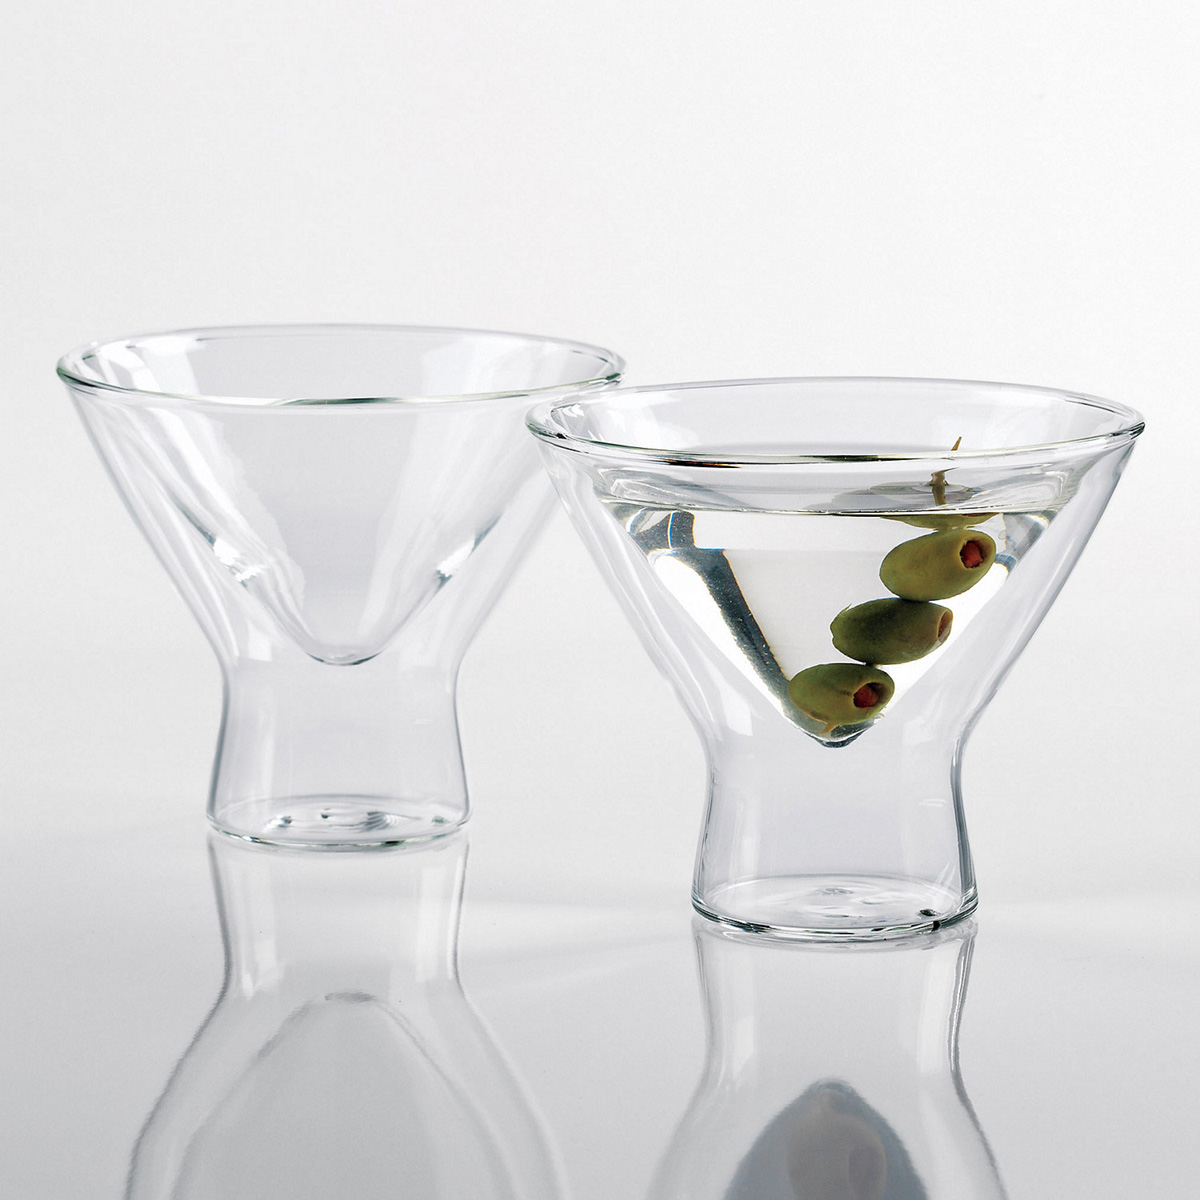 Steady Temp Martini Glasses The Green Head